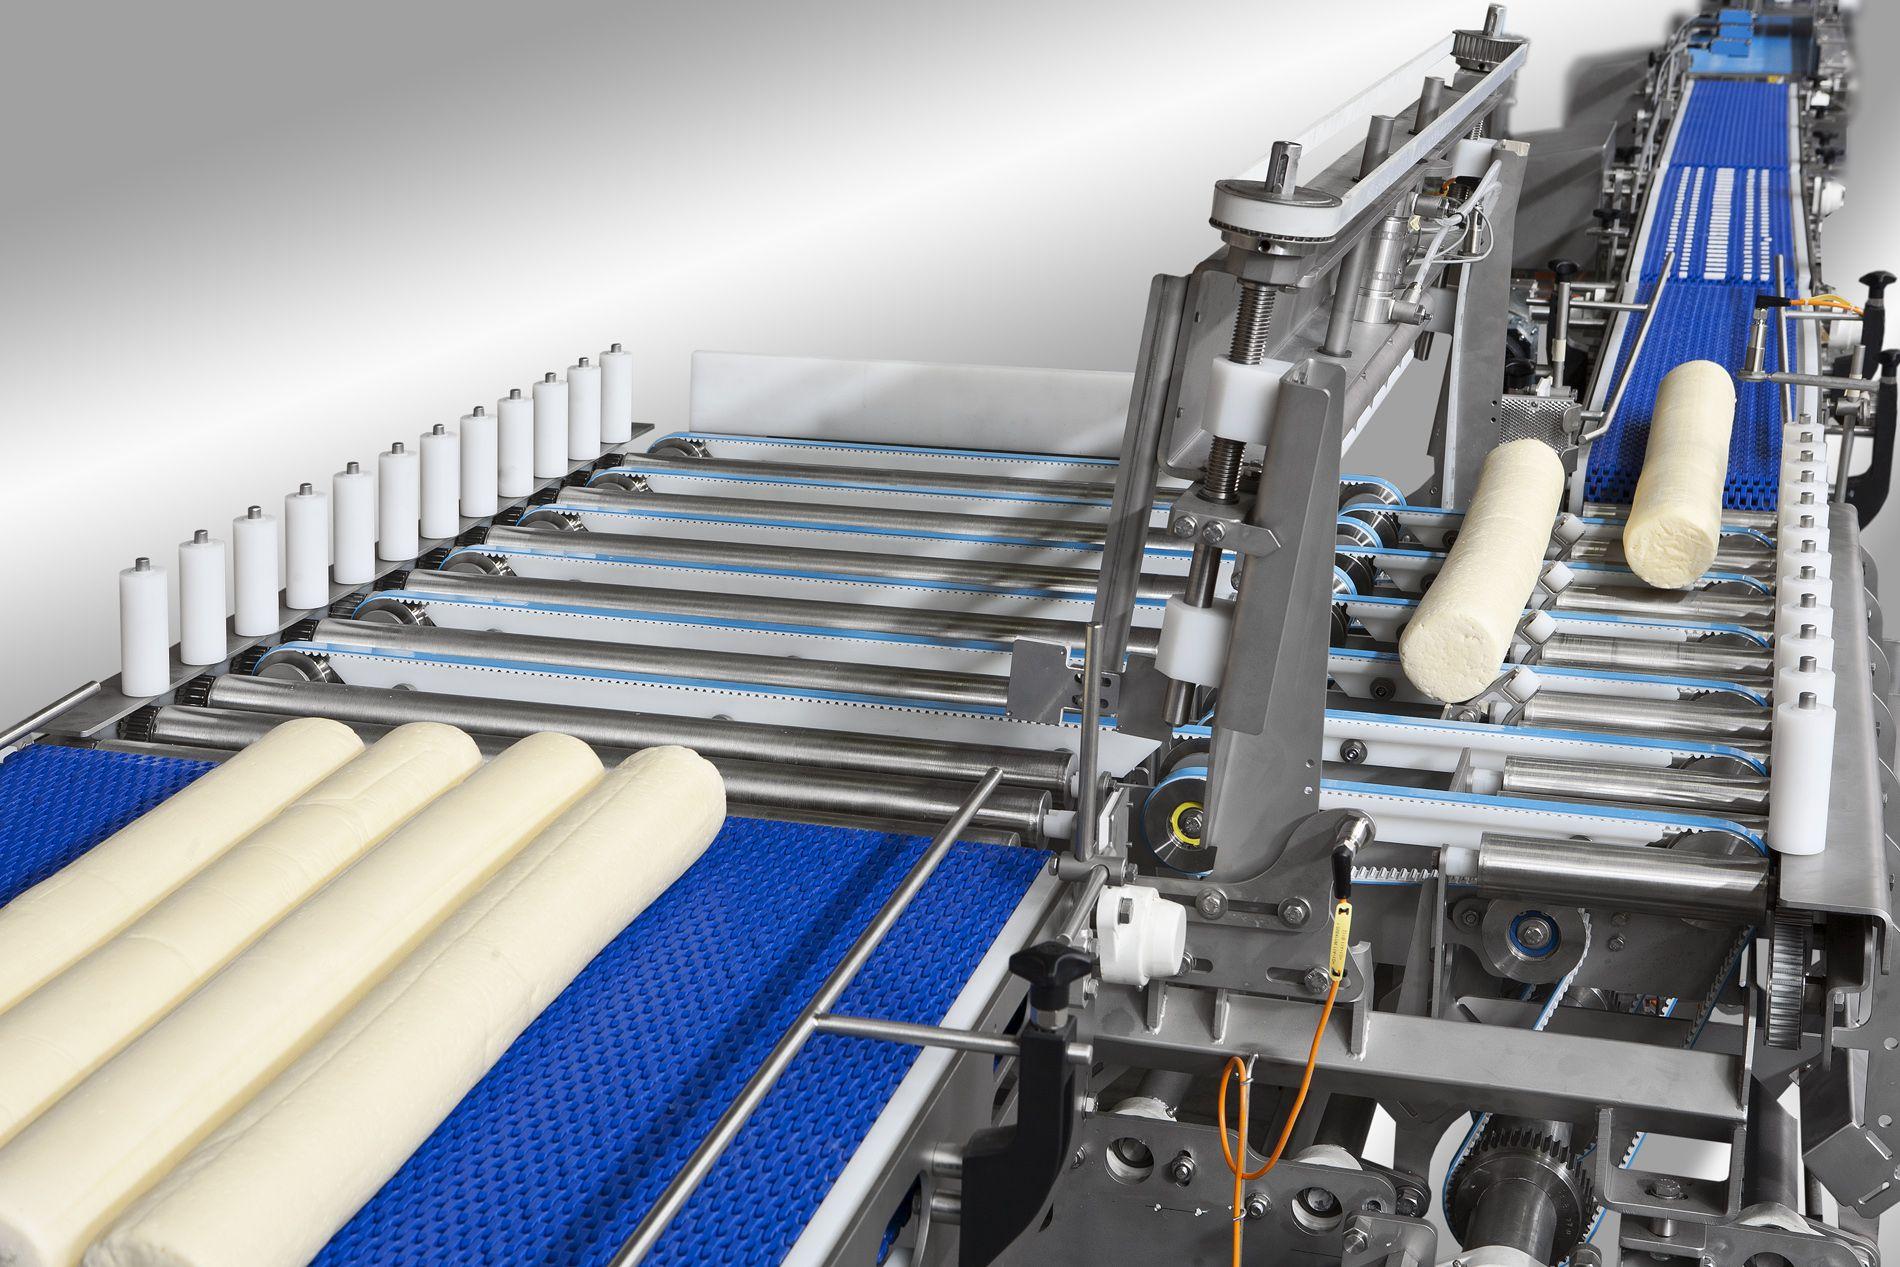 Cheese transporting conveyor belt